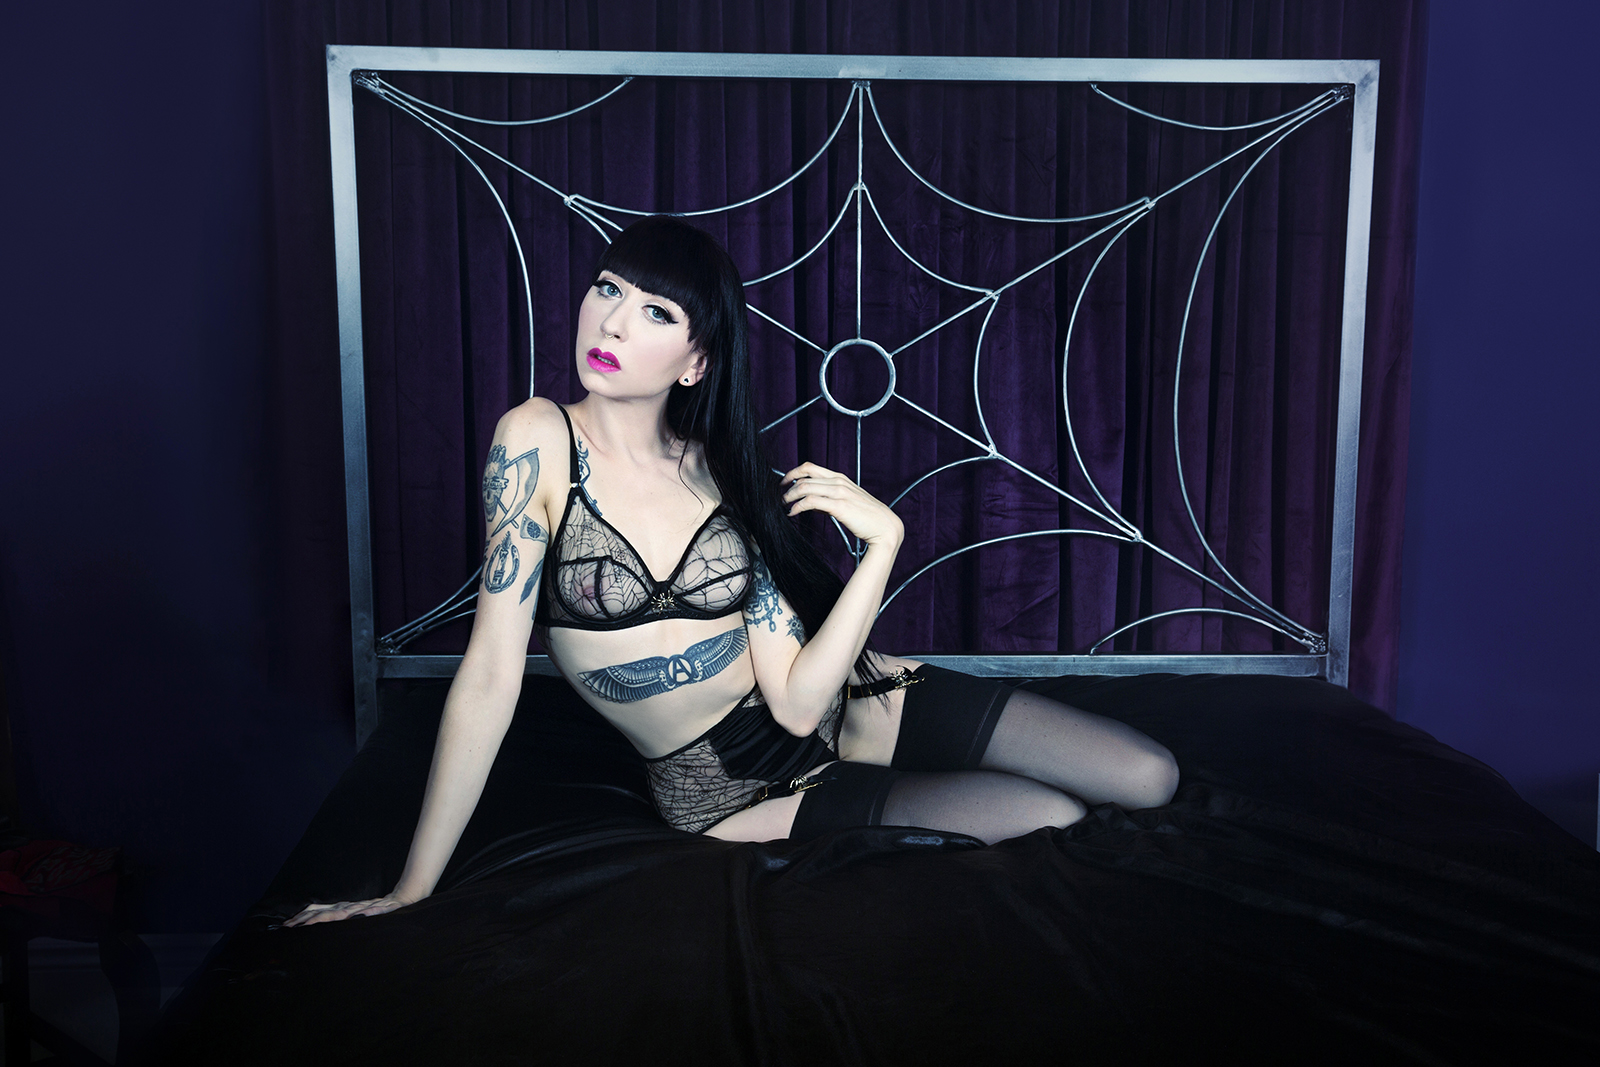 Mistress_Ramona_Ryder_Halloween_Pale_Goth_Punk_SF_NYC_Japan_2.jpg